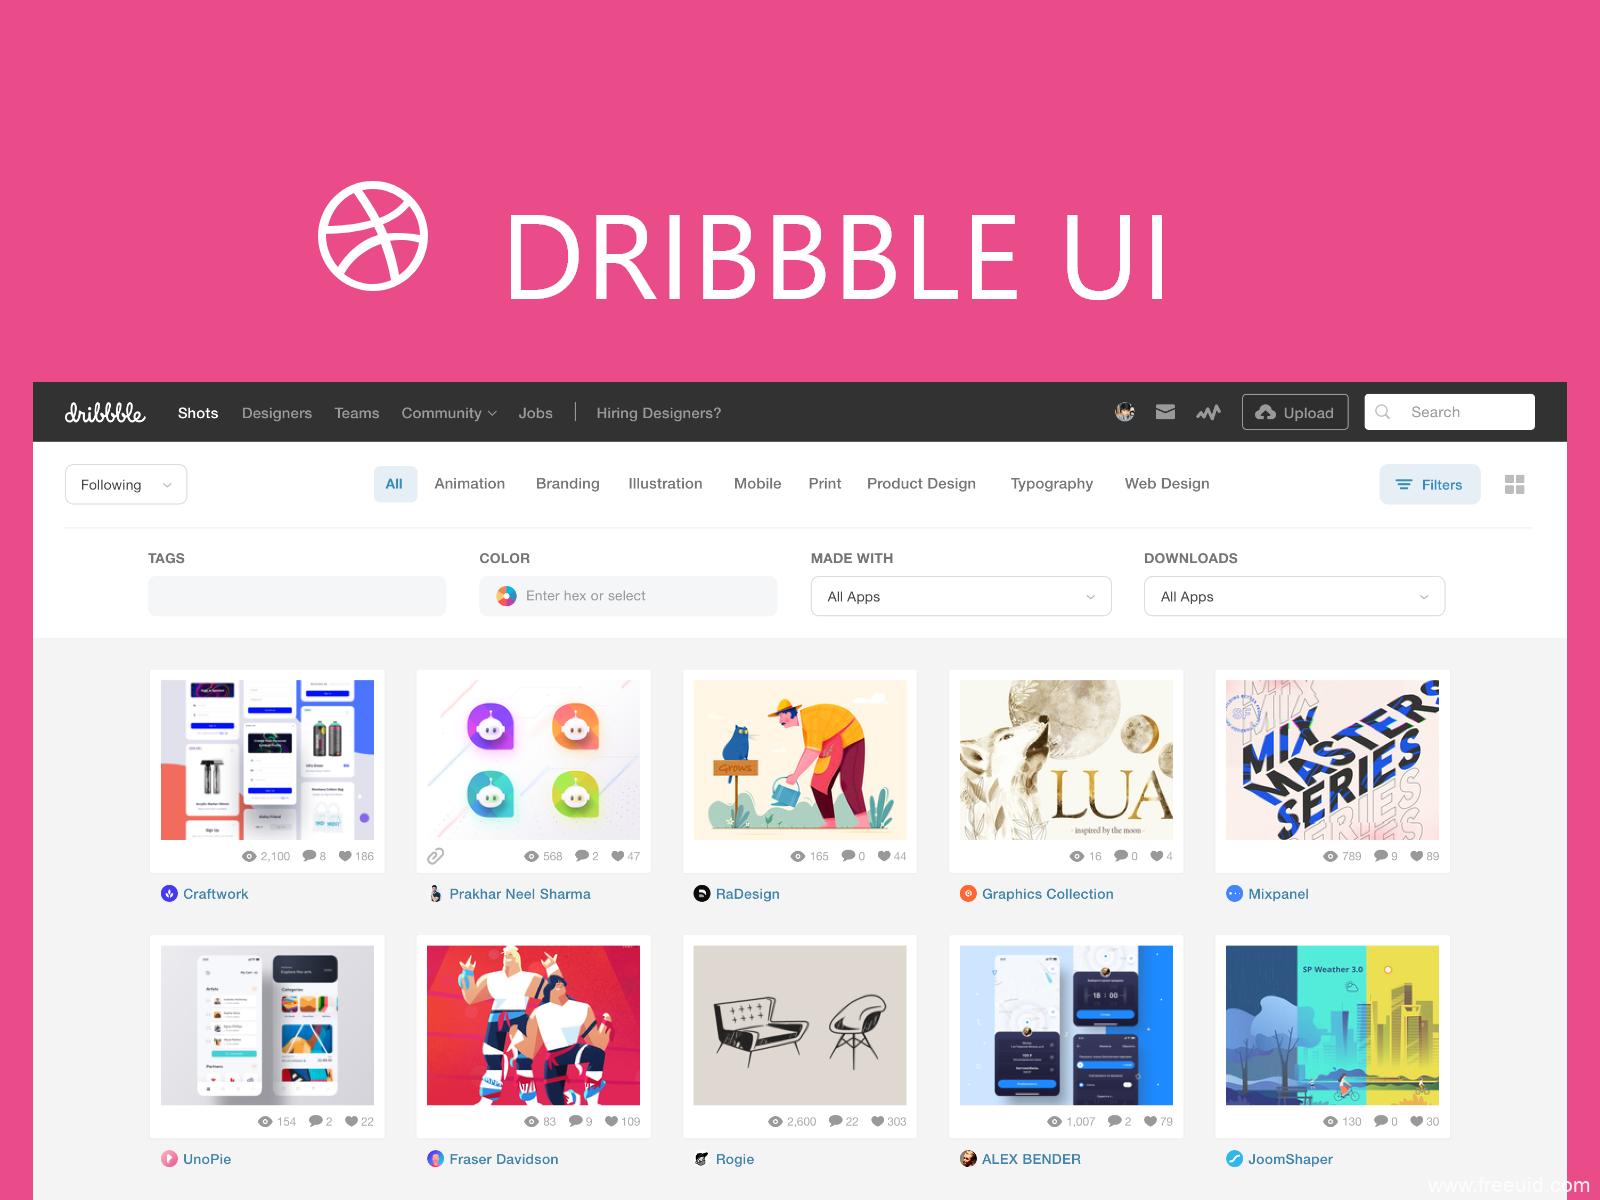 2019最新版dribbble首页设计稿,UI设计源文件,sketch源文件